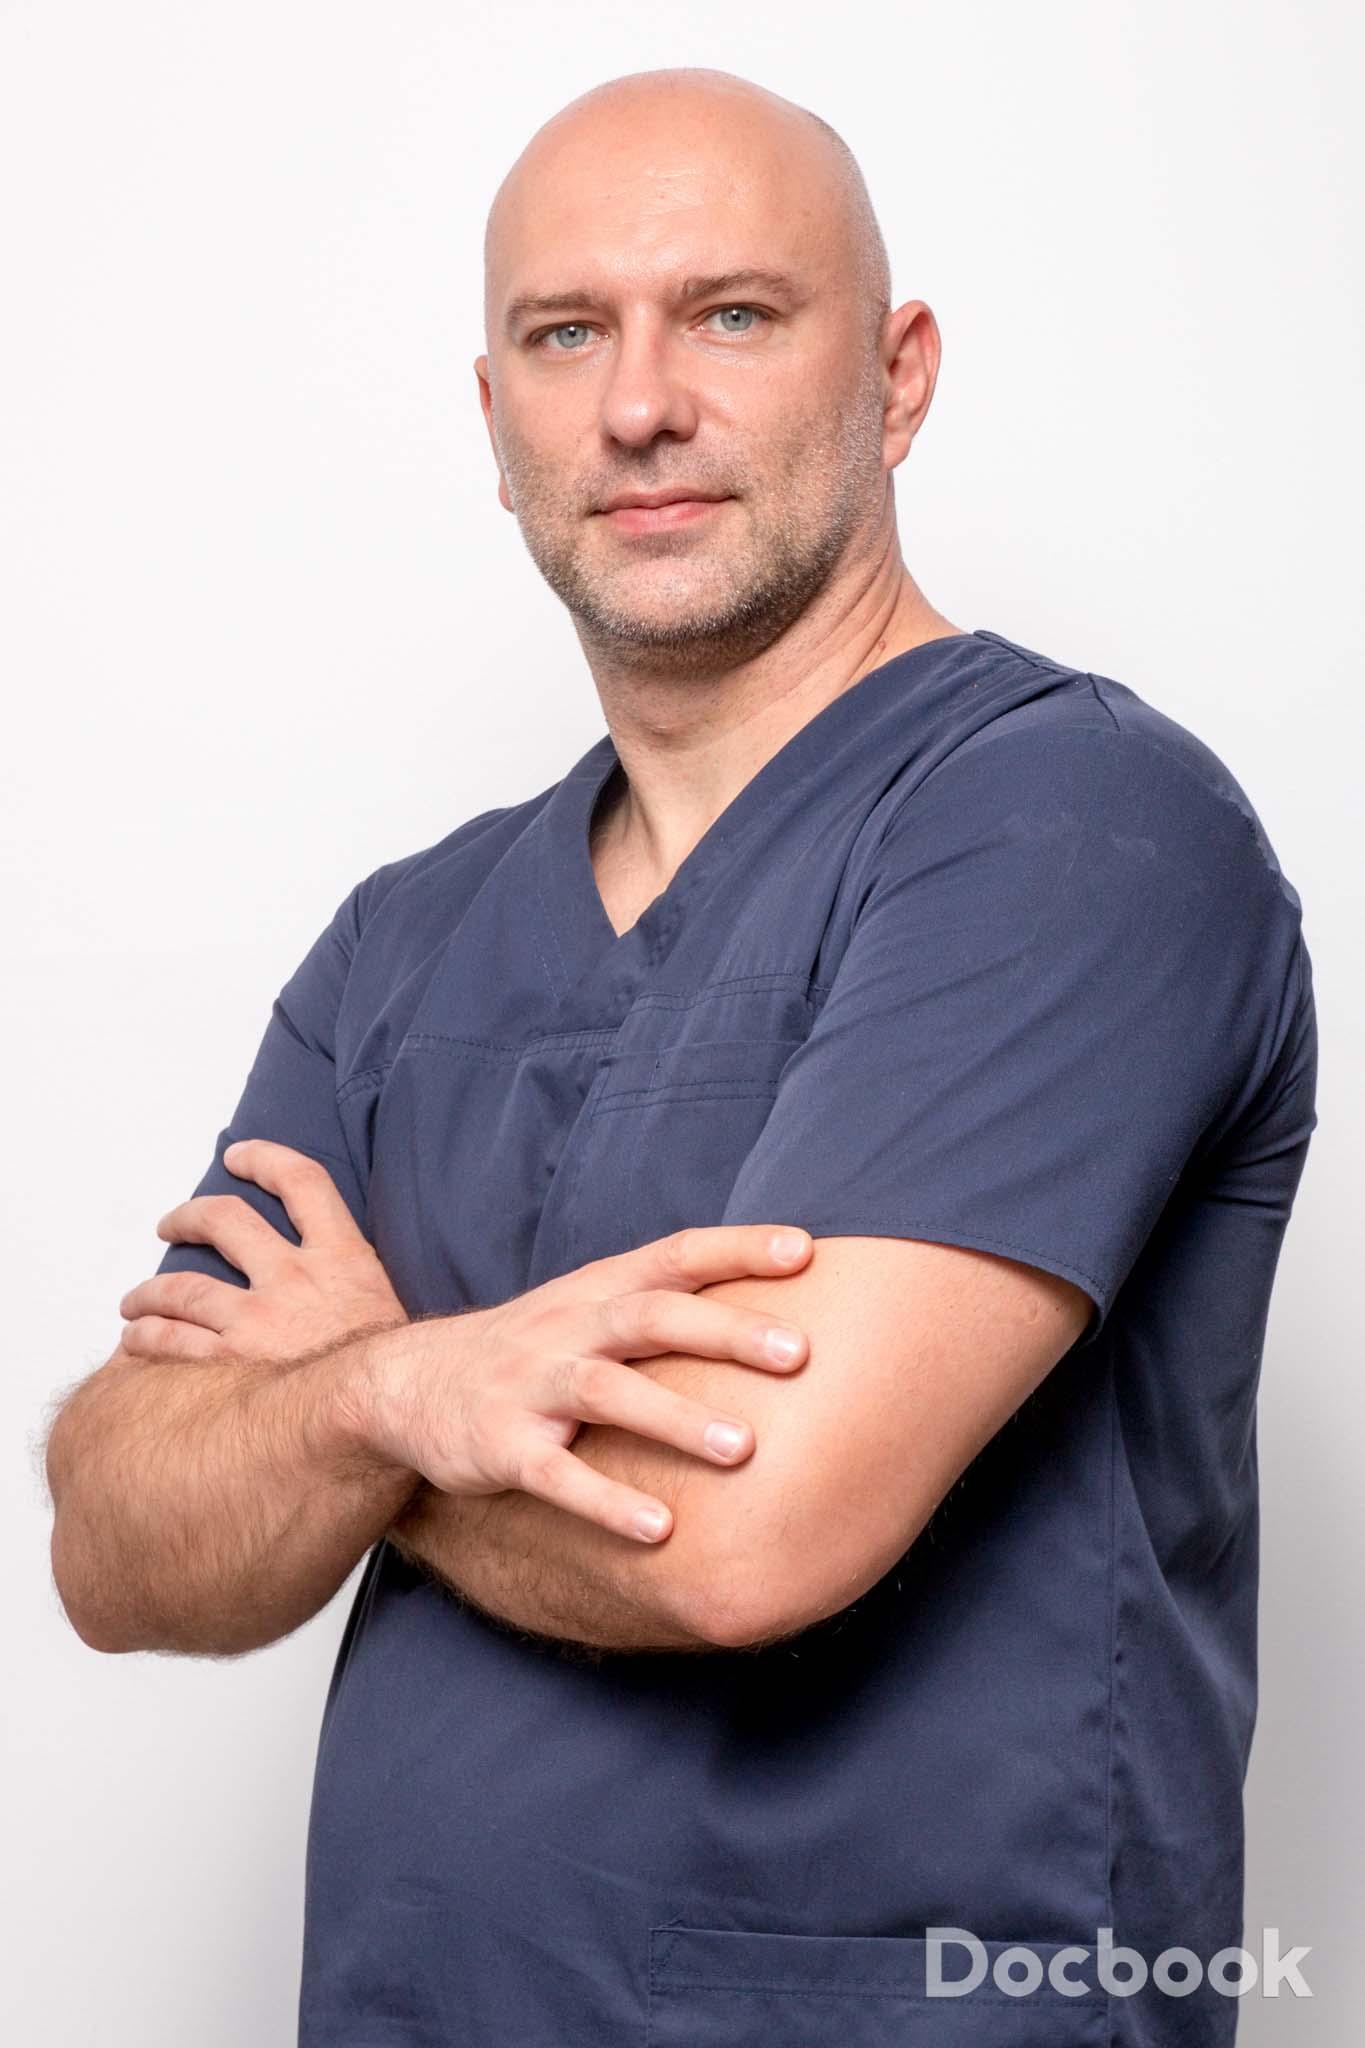 Dr. Lucian Stan